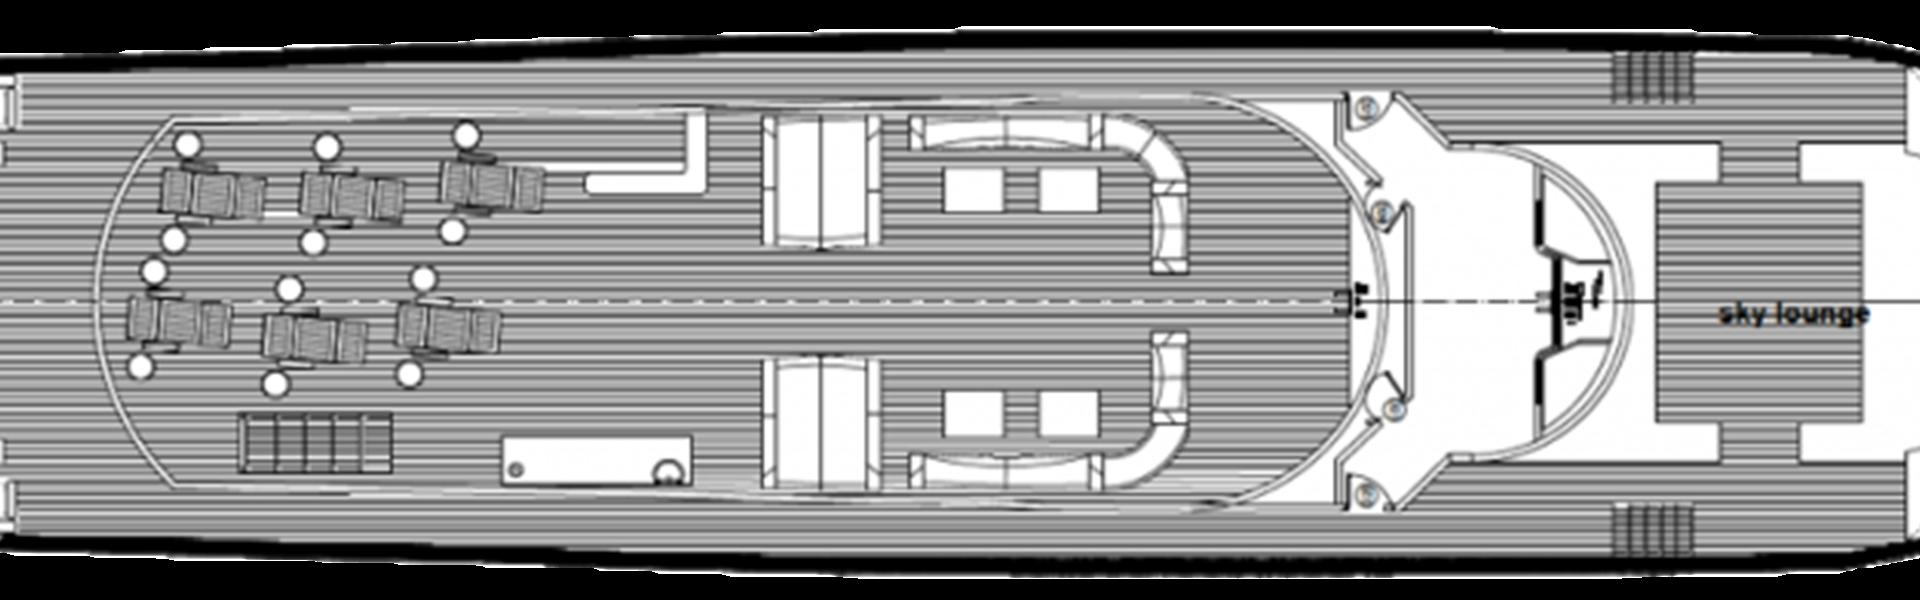 Skydeck deck plan